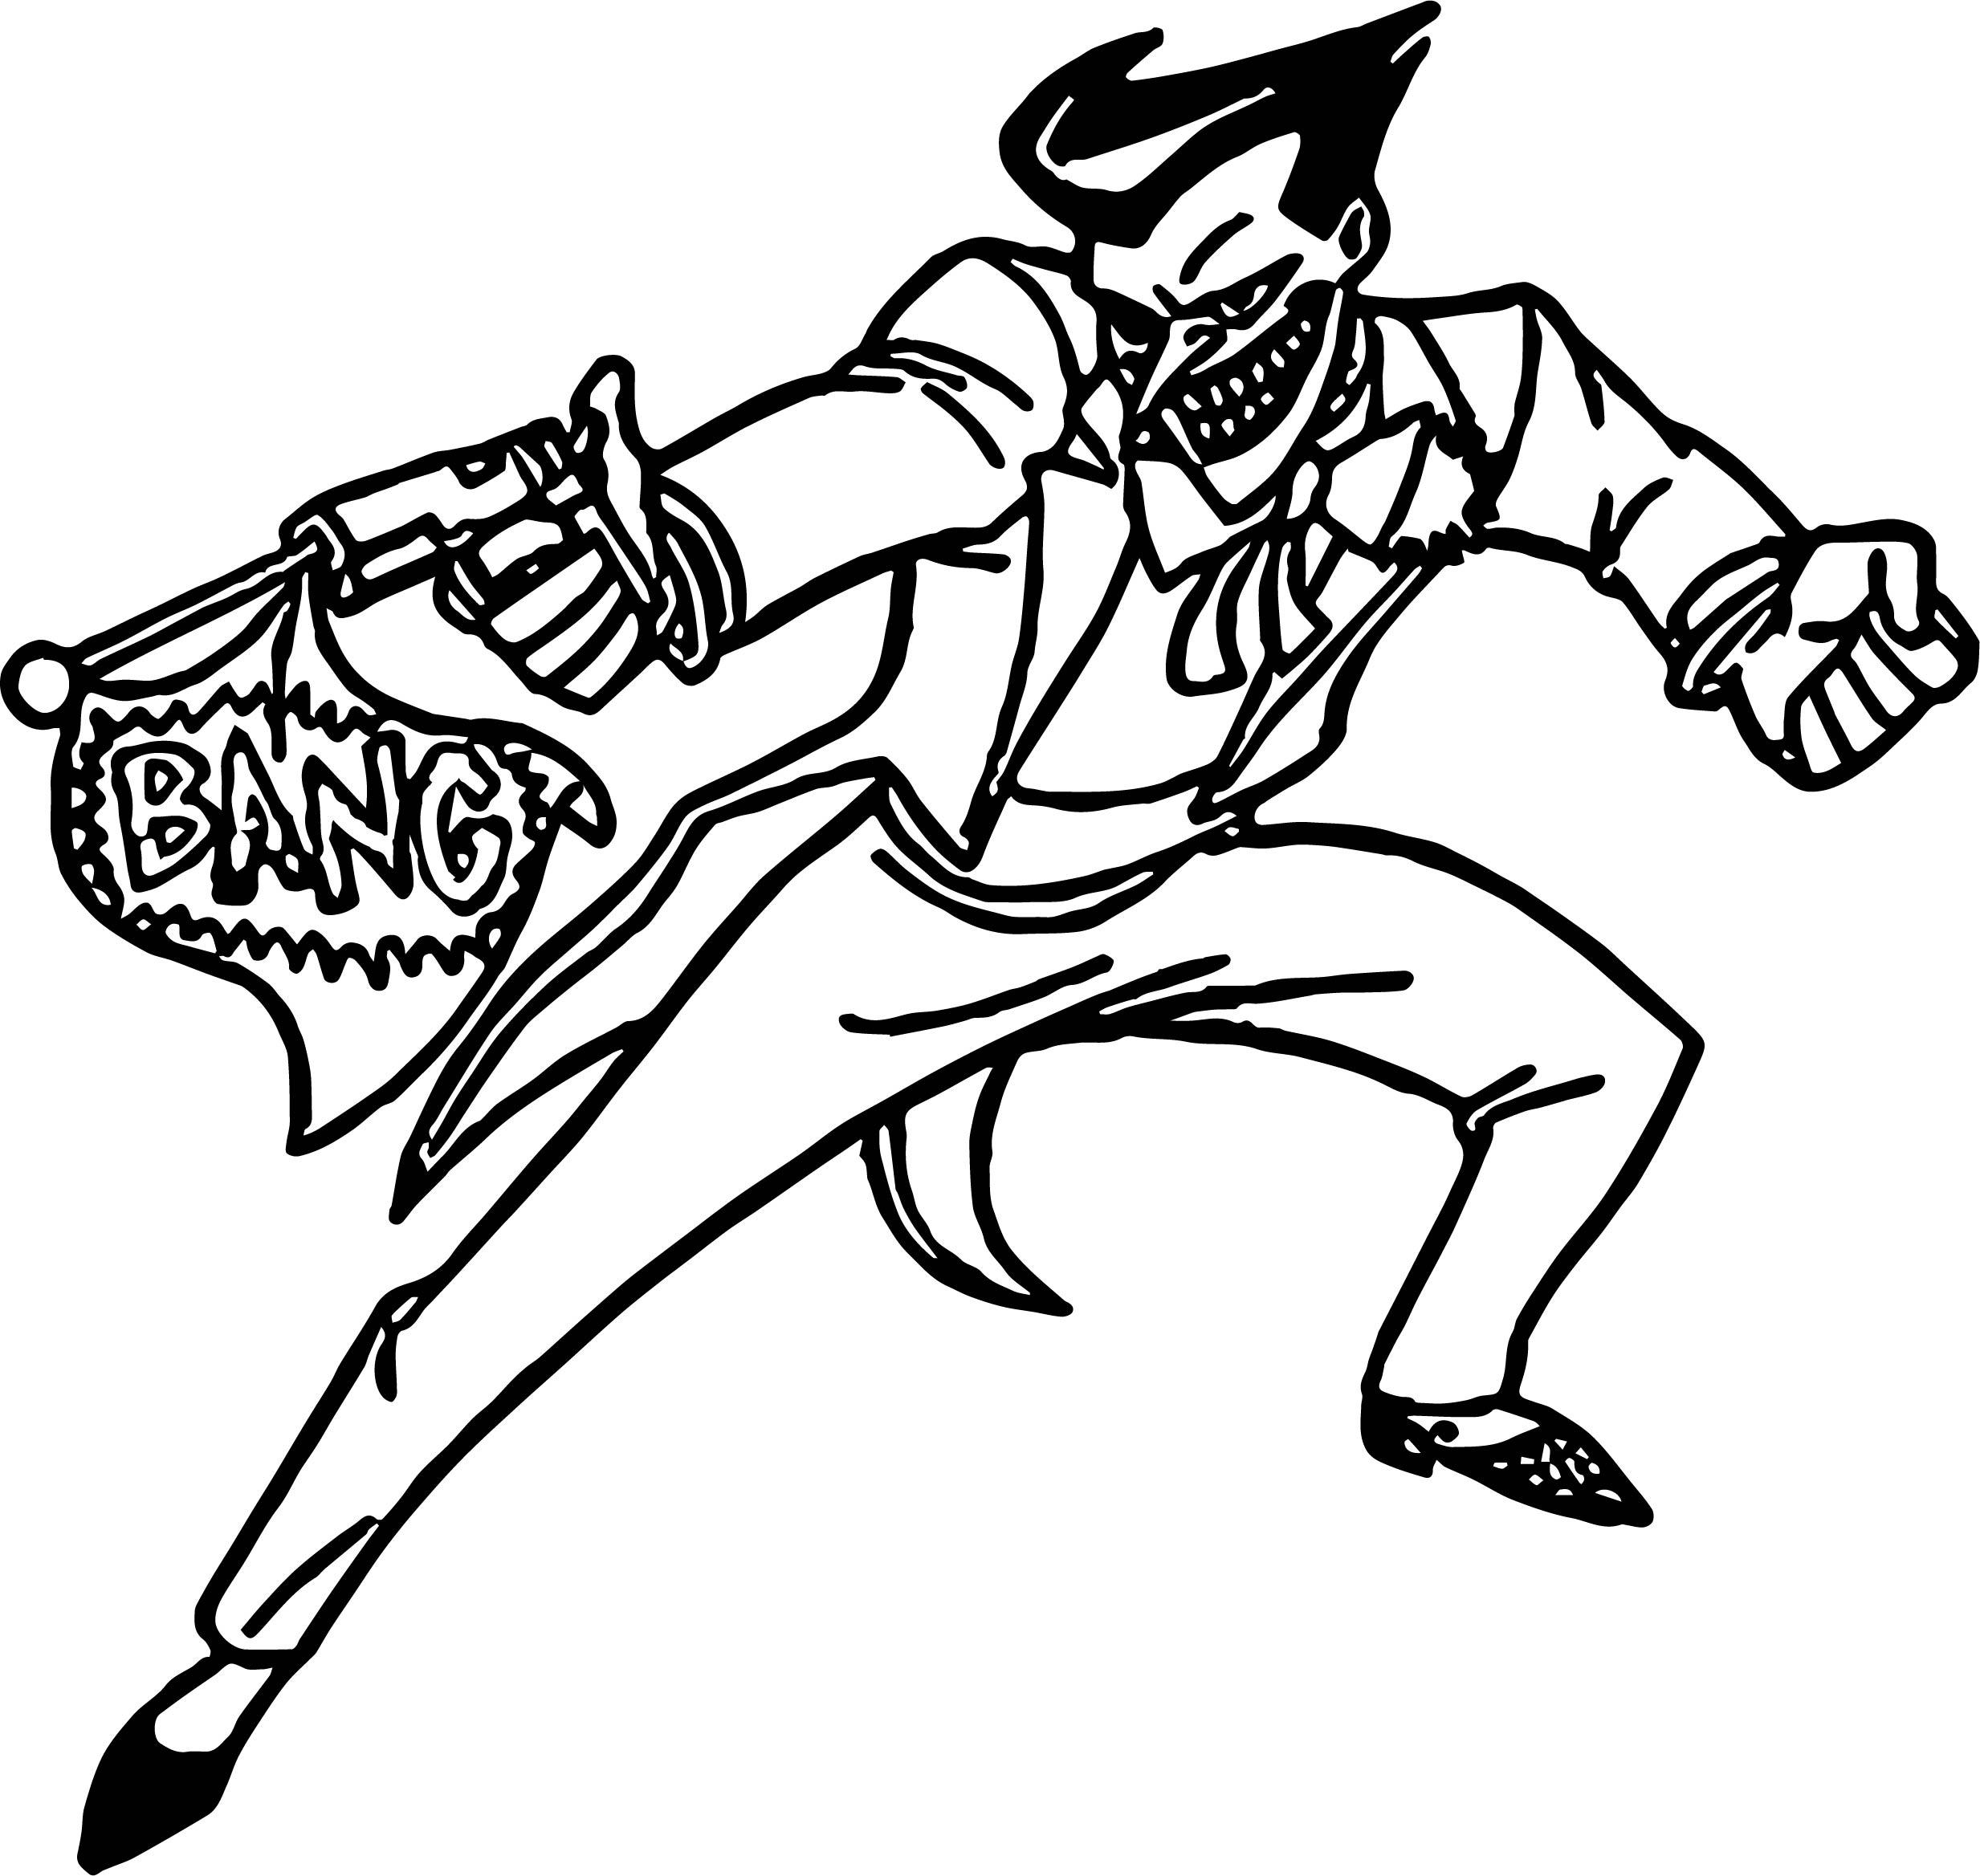 Joker From Batman Bang Joke Coloring Page